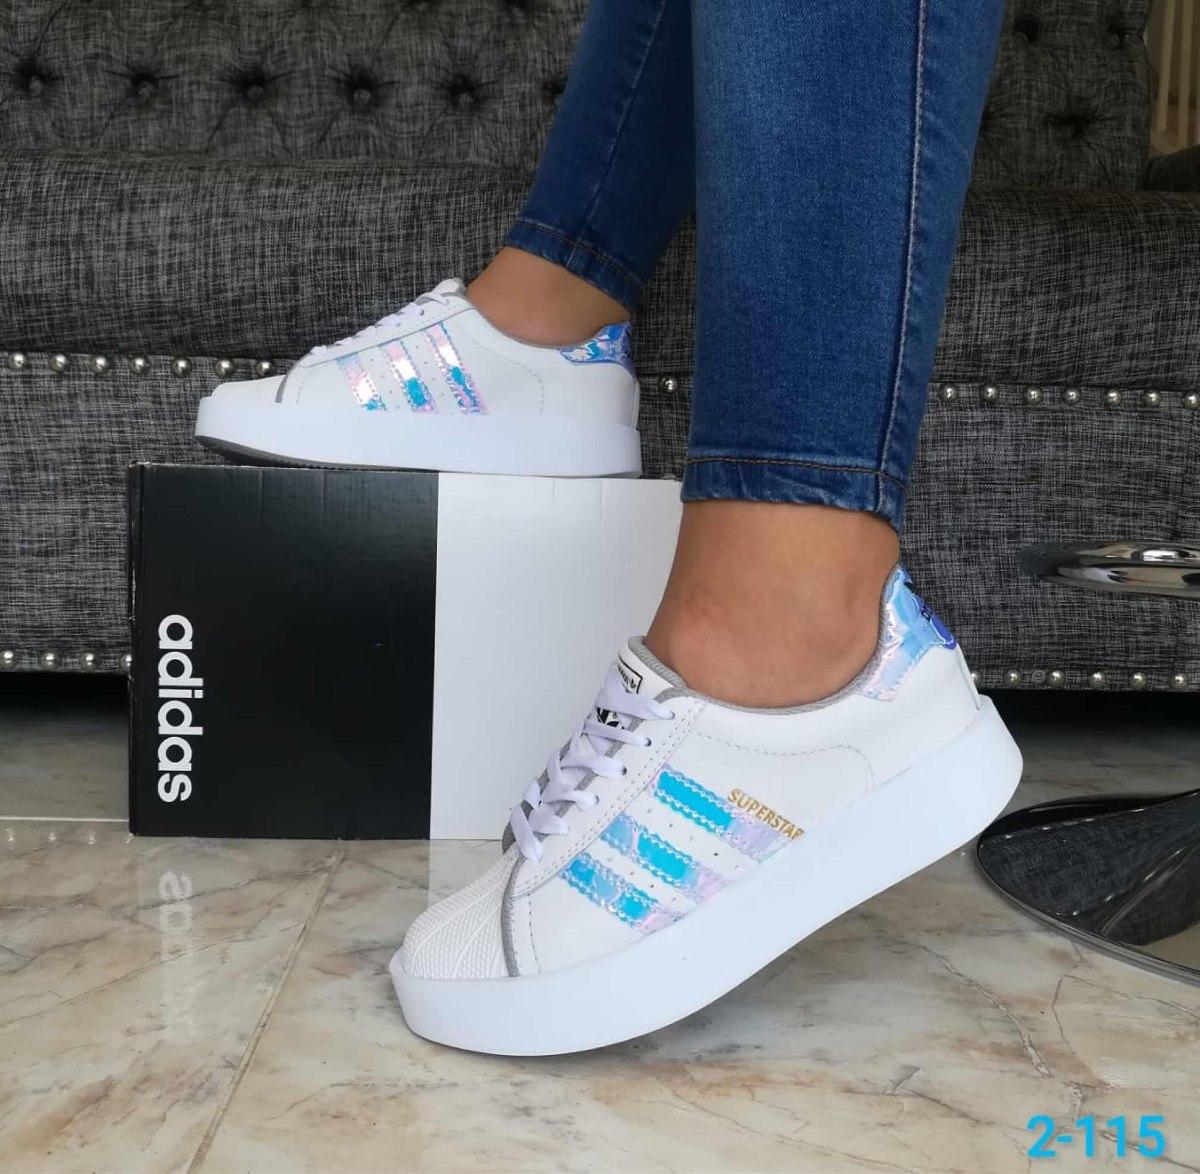 Zapatos Deportivos adidas Superstar Dama 2018